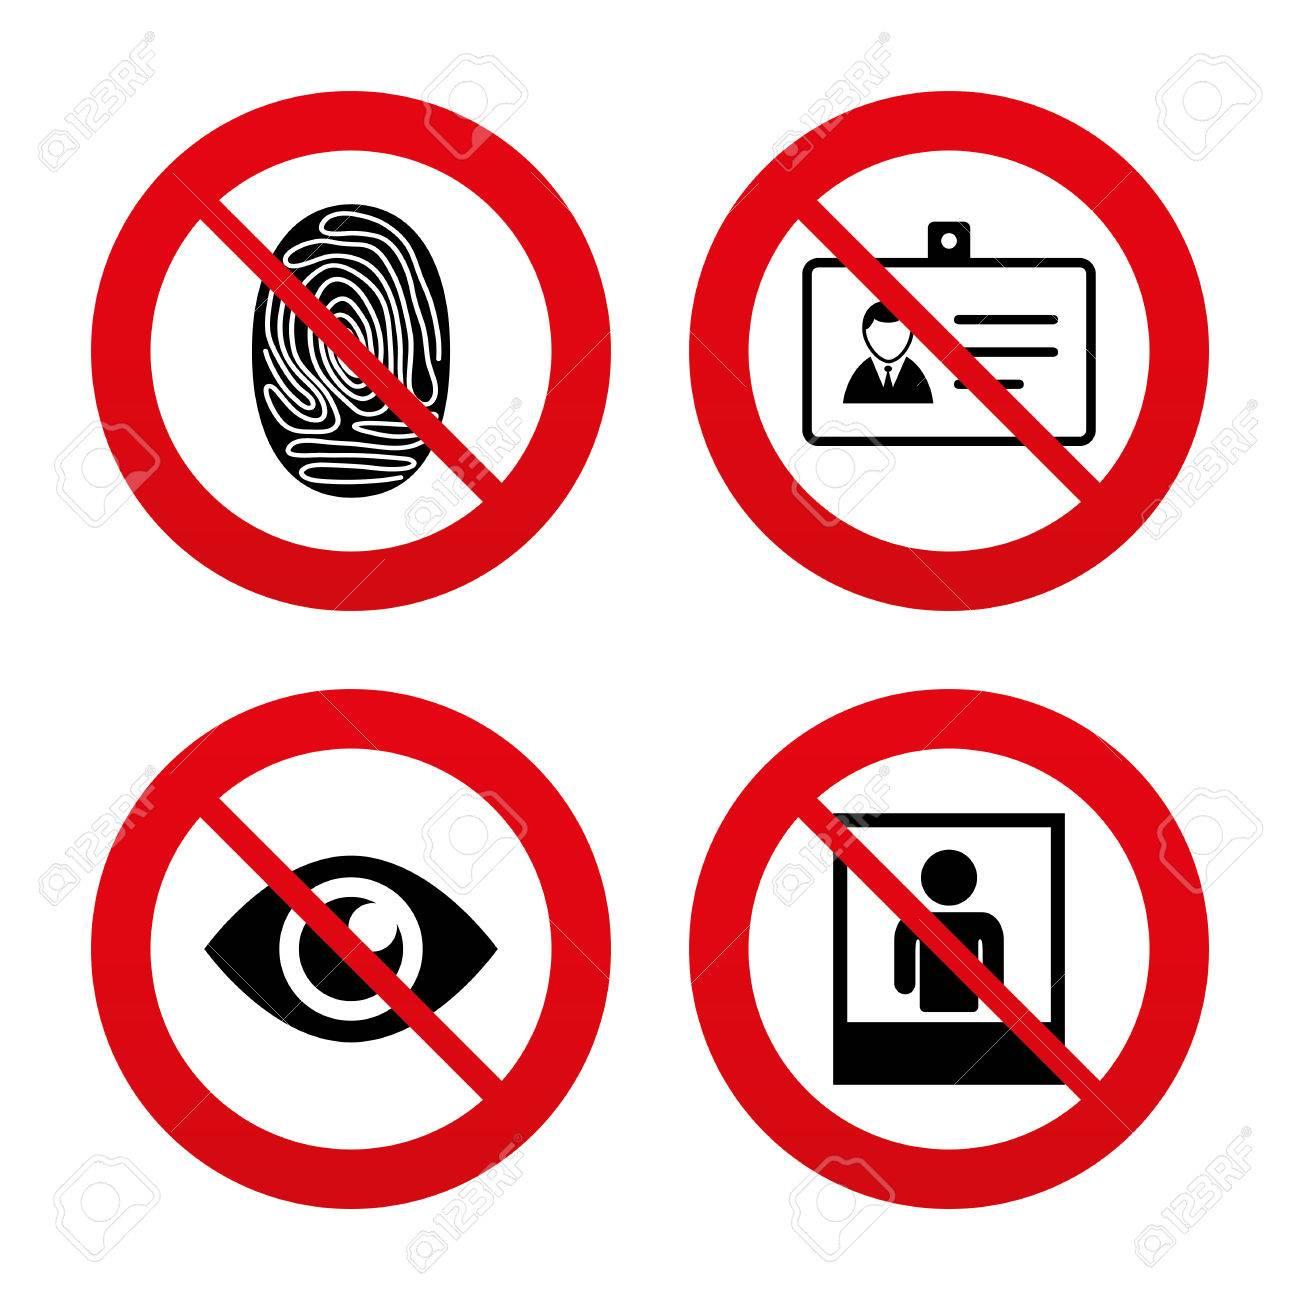 Signos No, Ban O Detenerse. ID Identidad Iconos Insignia Tarjeta ...